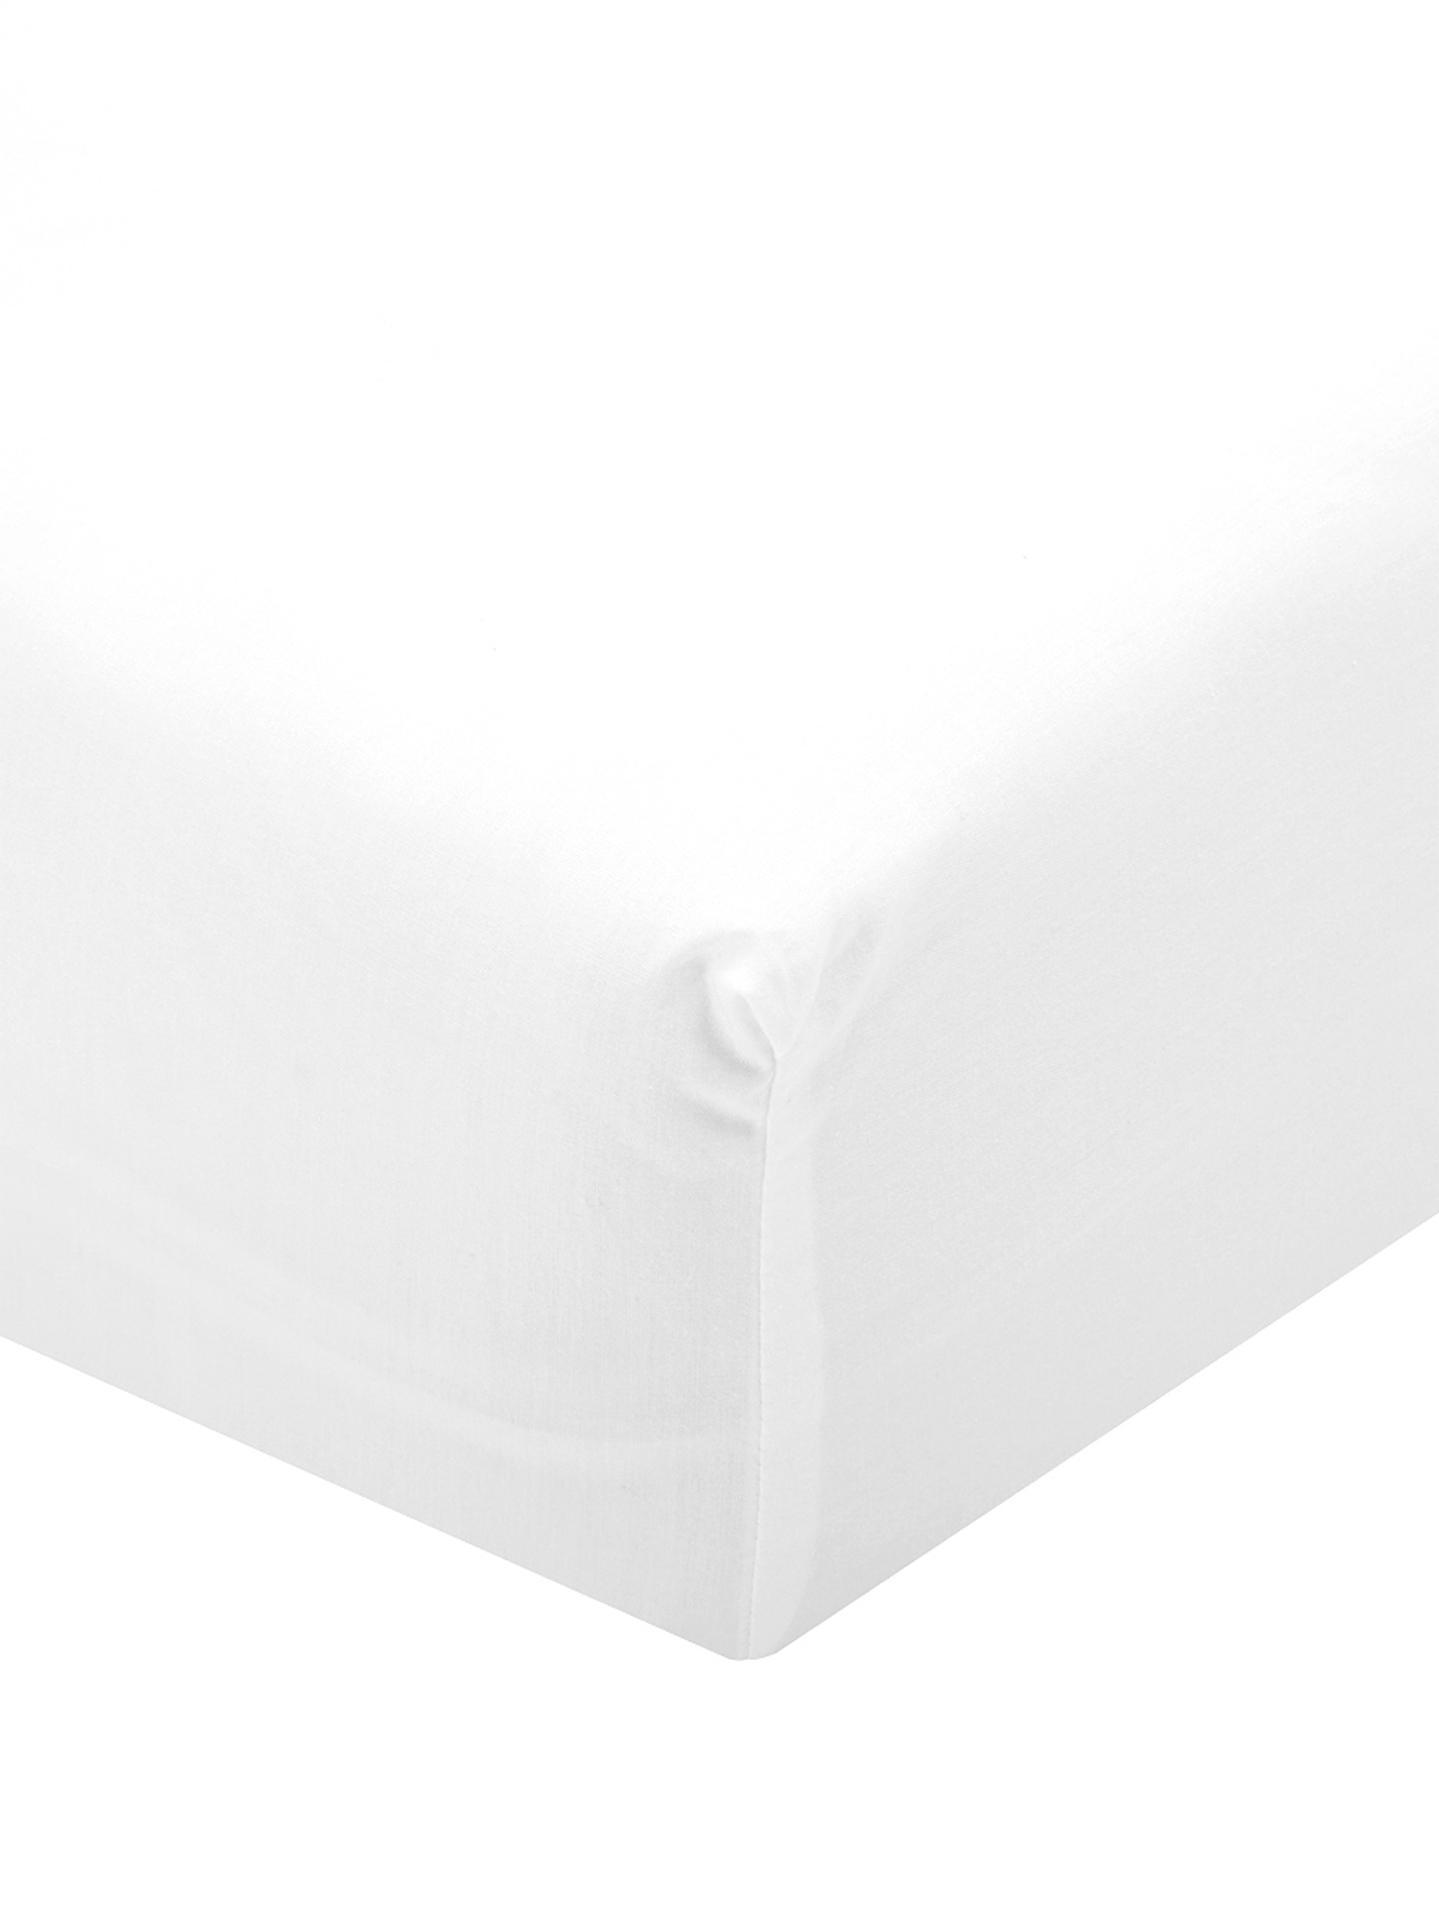 Lenzuolo con angoli in percalle Elsie, Tessuto: percalle, Bianco, Larg. 90 x Lung. 200 cm